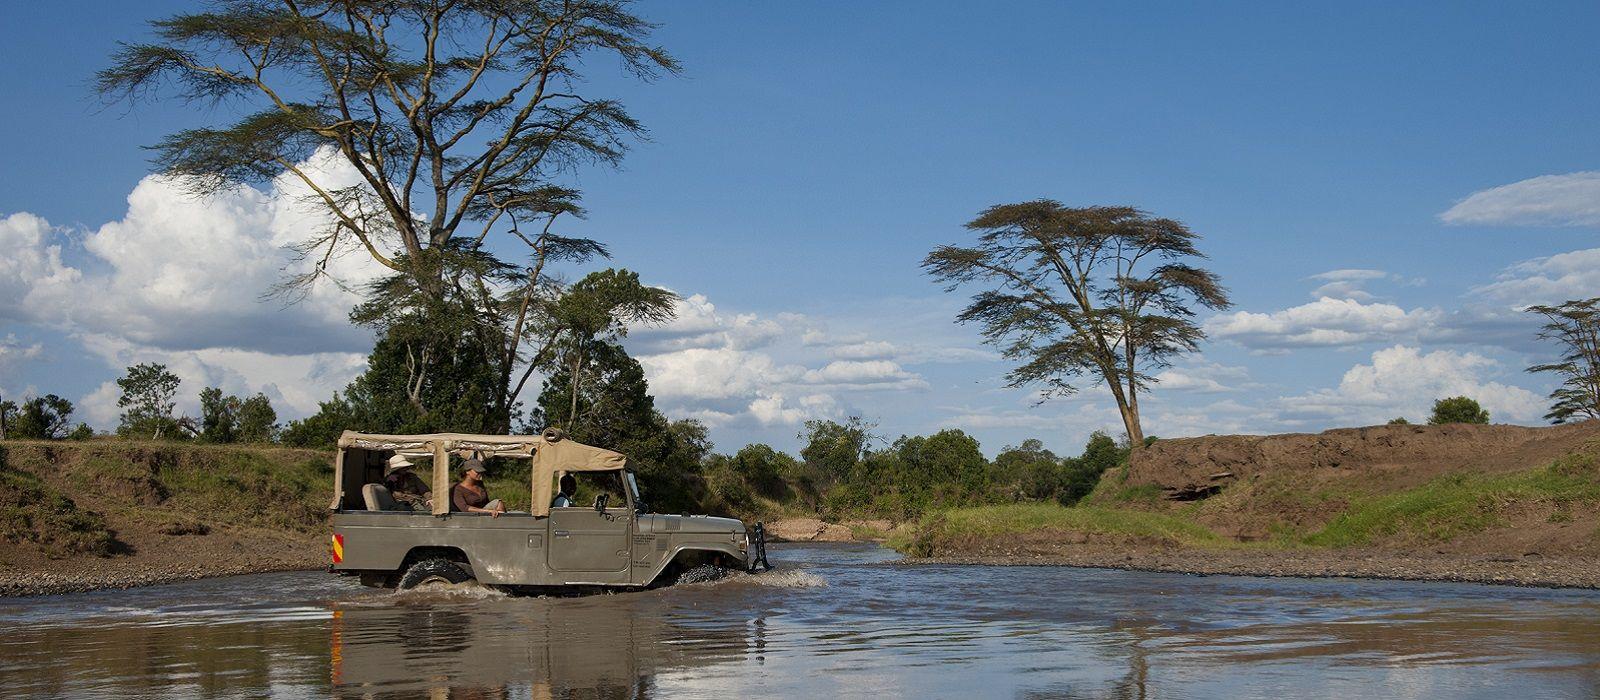 Destination Laikipia – Ol Pejeta / Solio Kenya